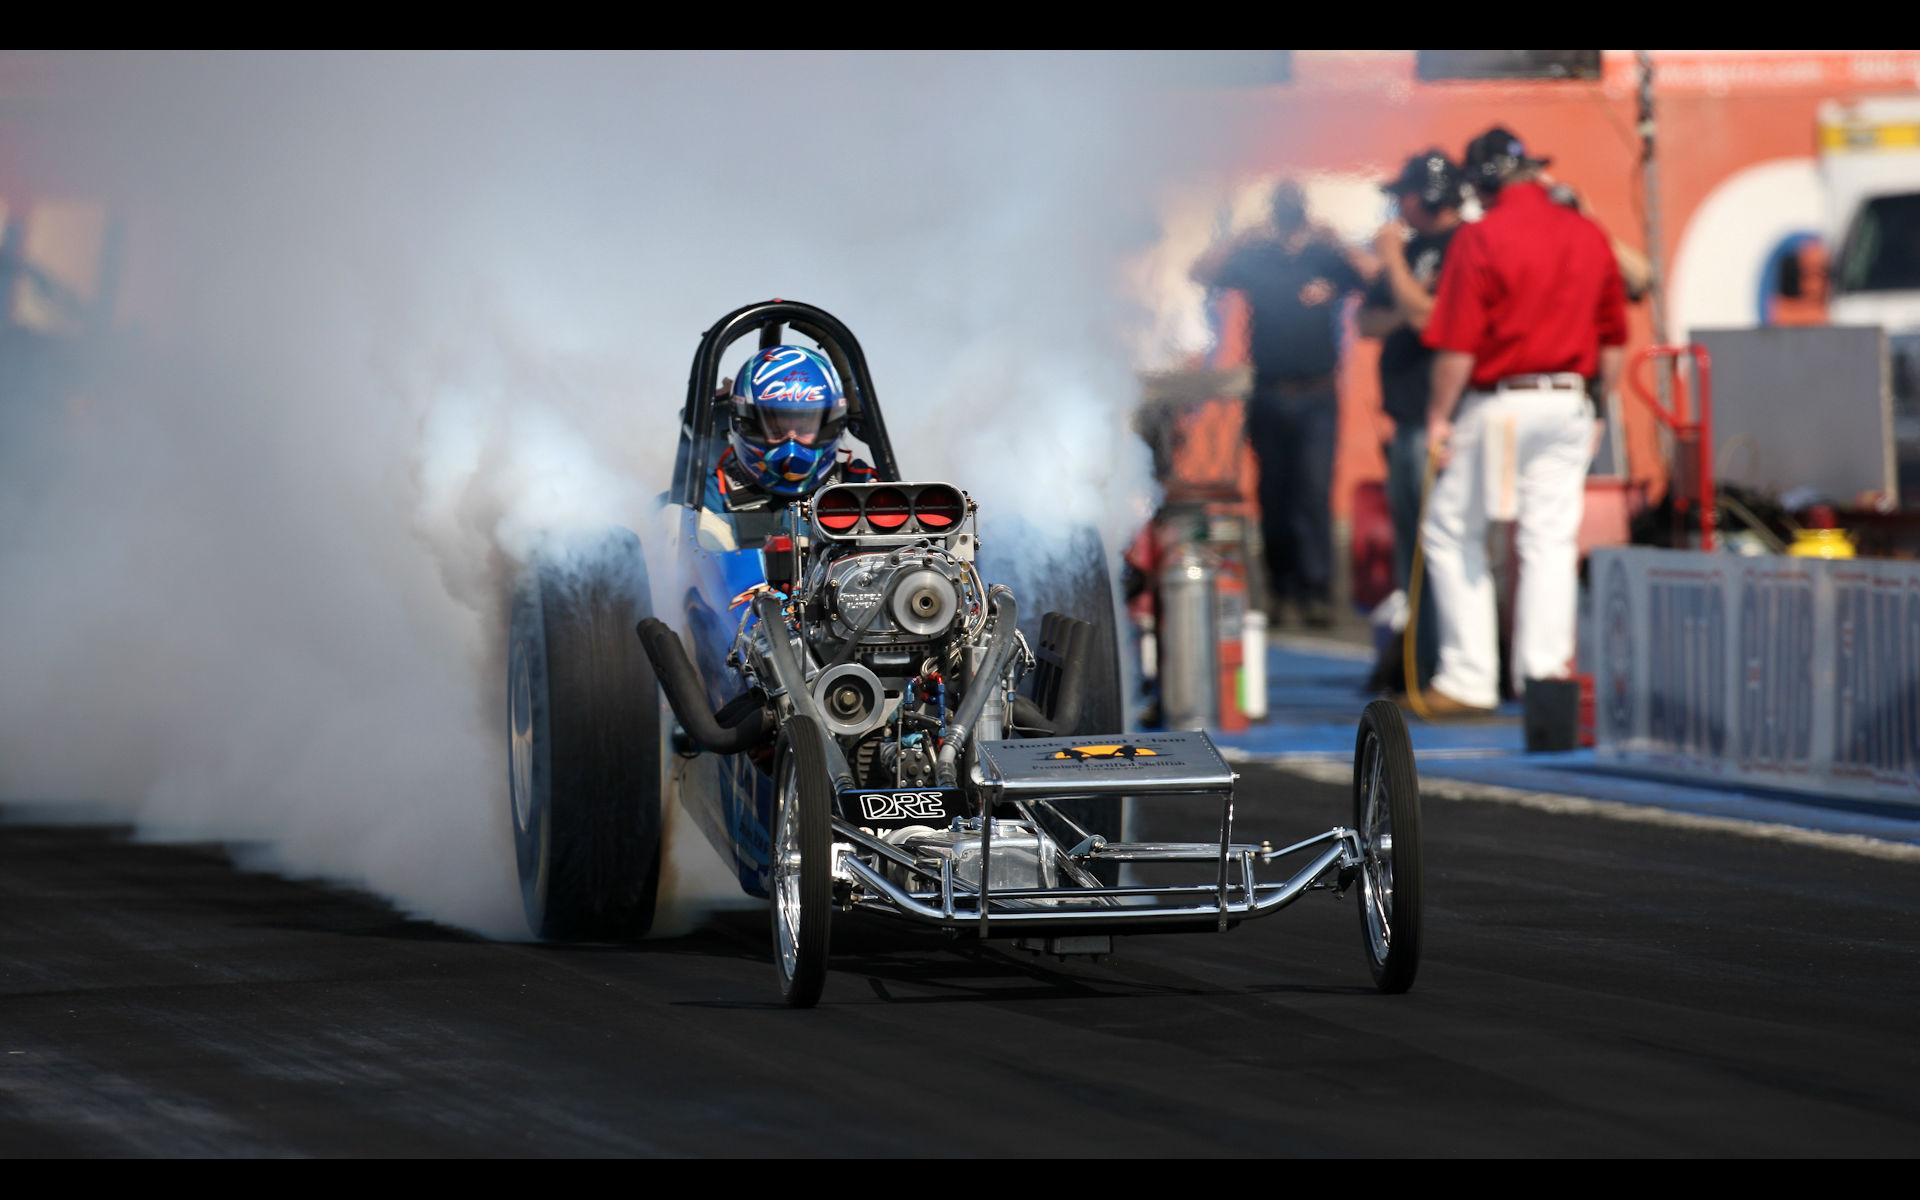 nhra drag racing hot rod engine burn smoke wallpaper background 1920x1200